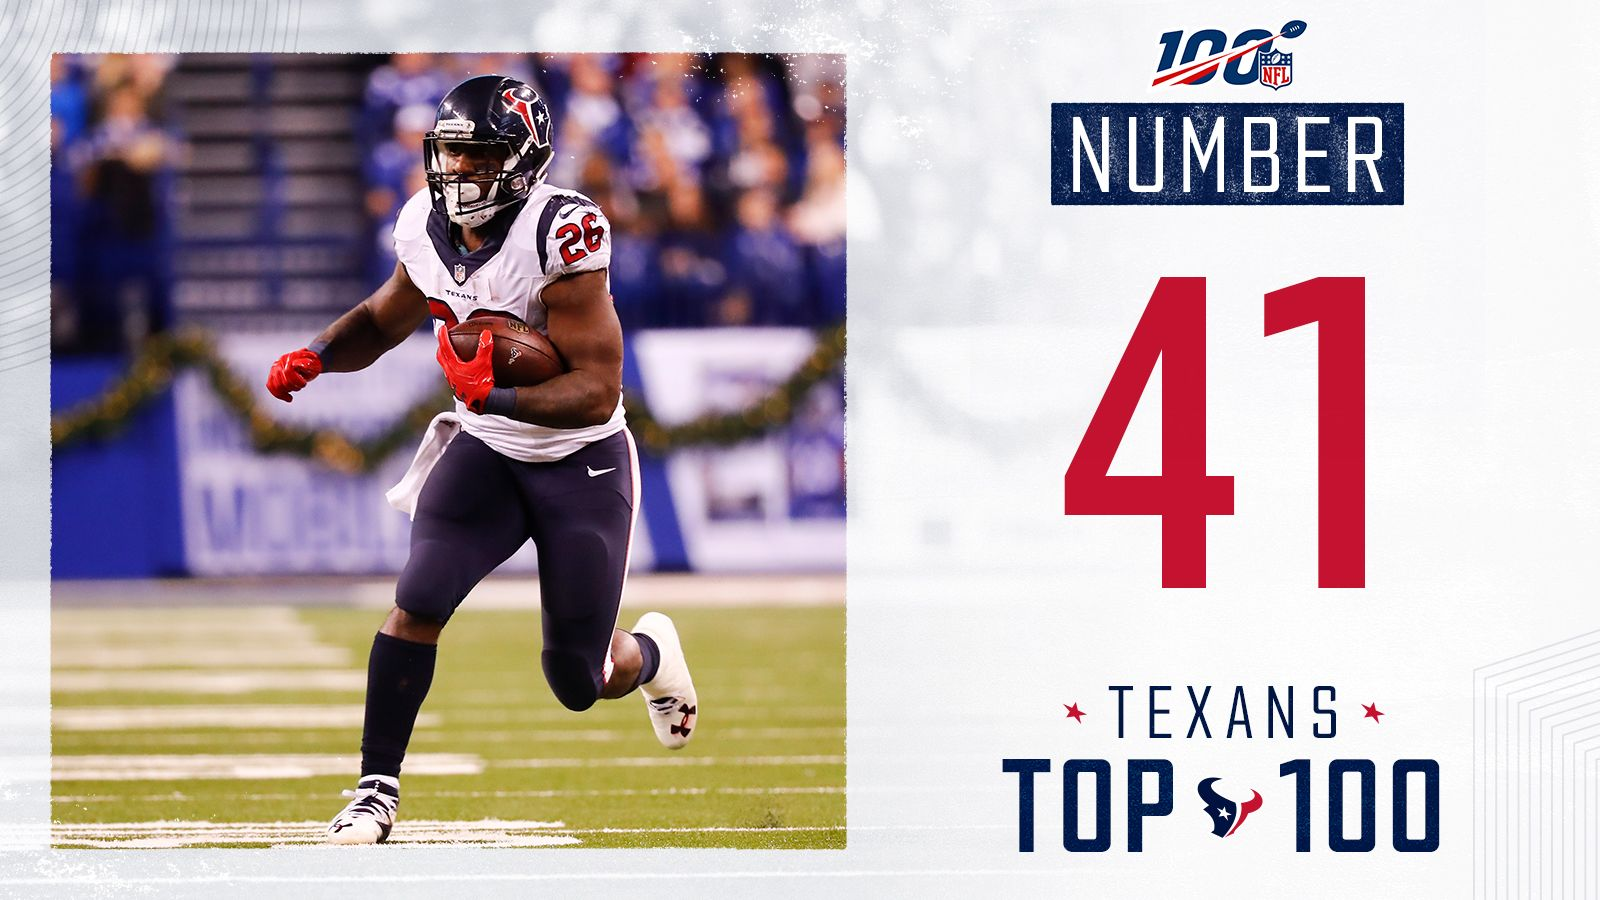 41-Texans win in OT vs. Colts in 2016 - TWITTER